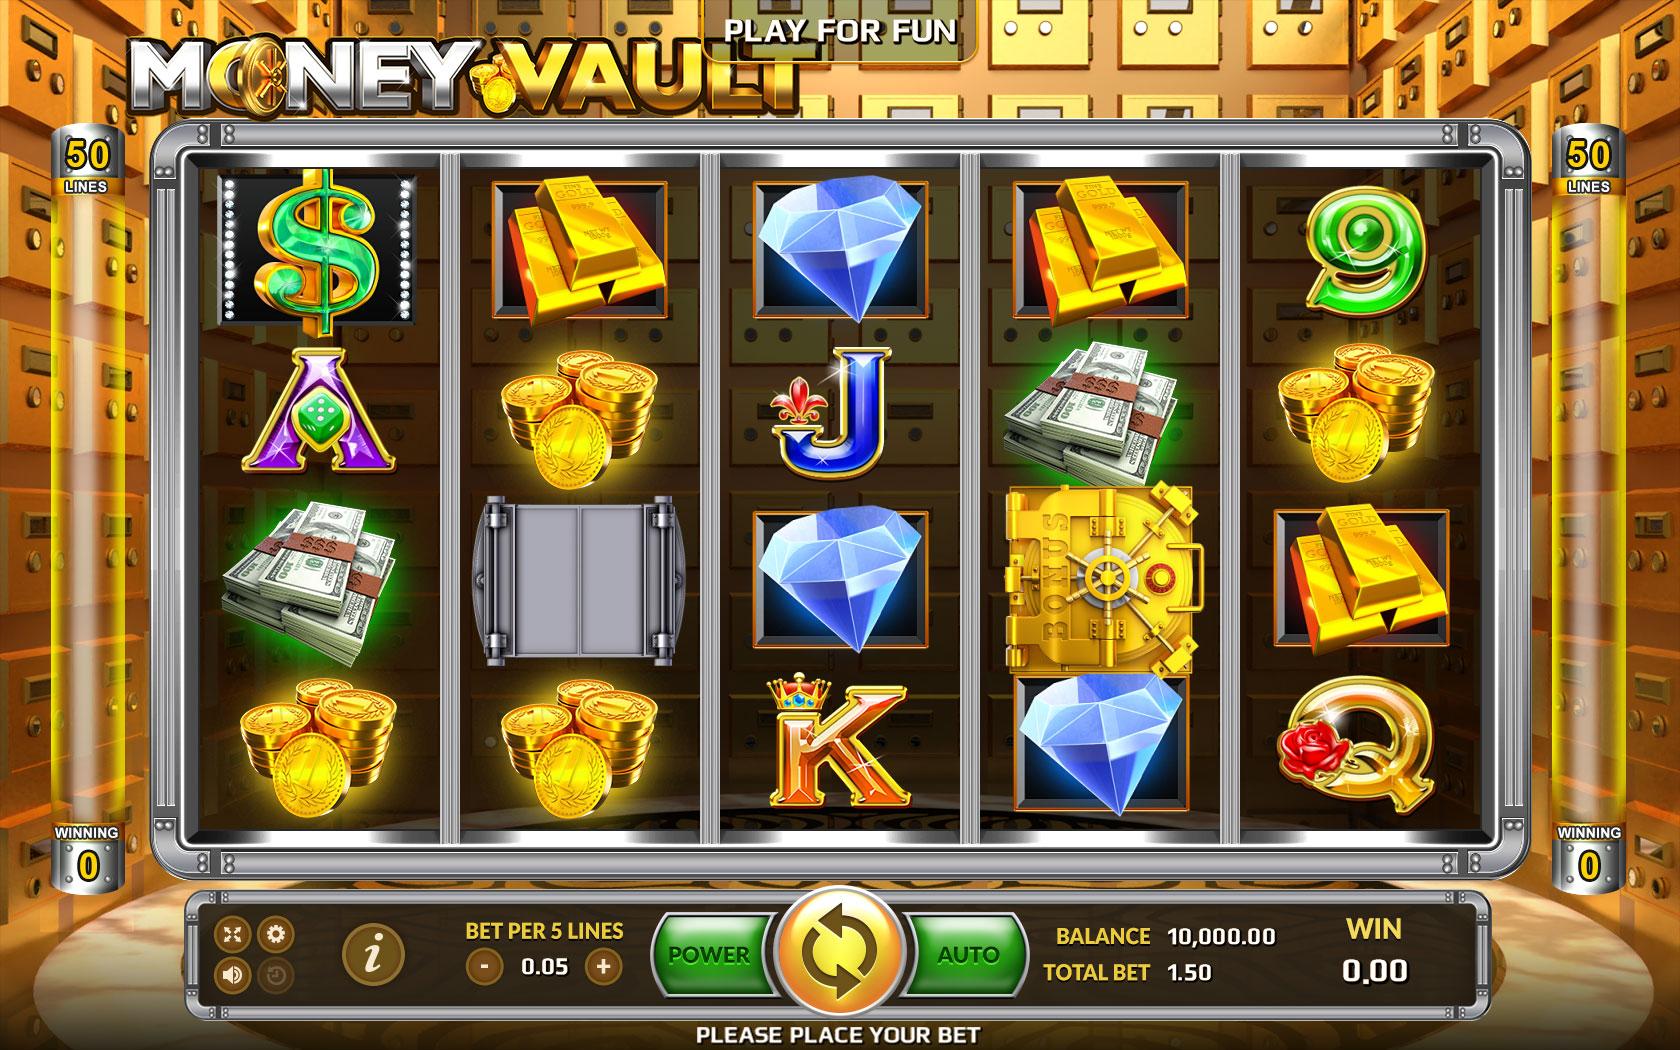 Money Vault รีวิวเกมสล็อต กับ ภารกิจปล้นเงิน-Gametips